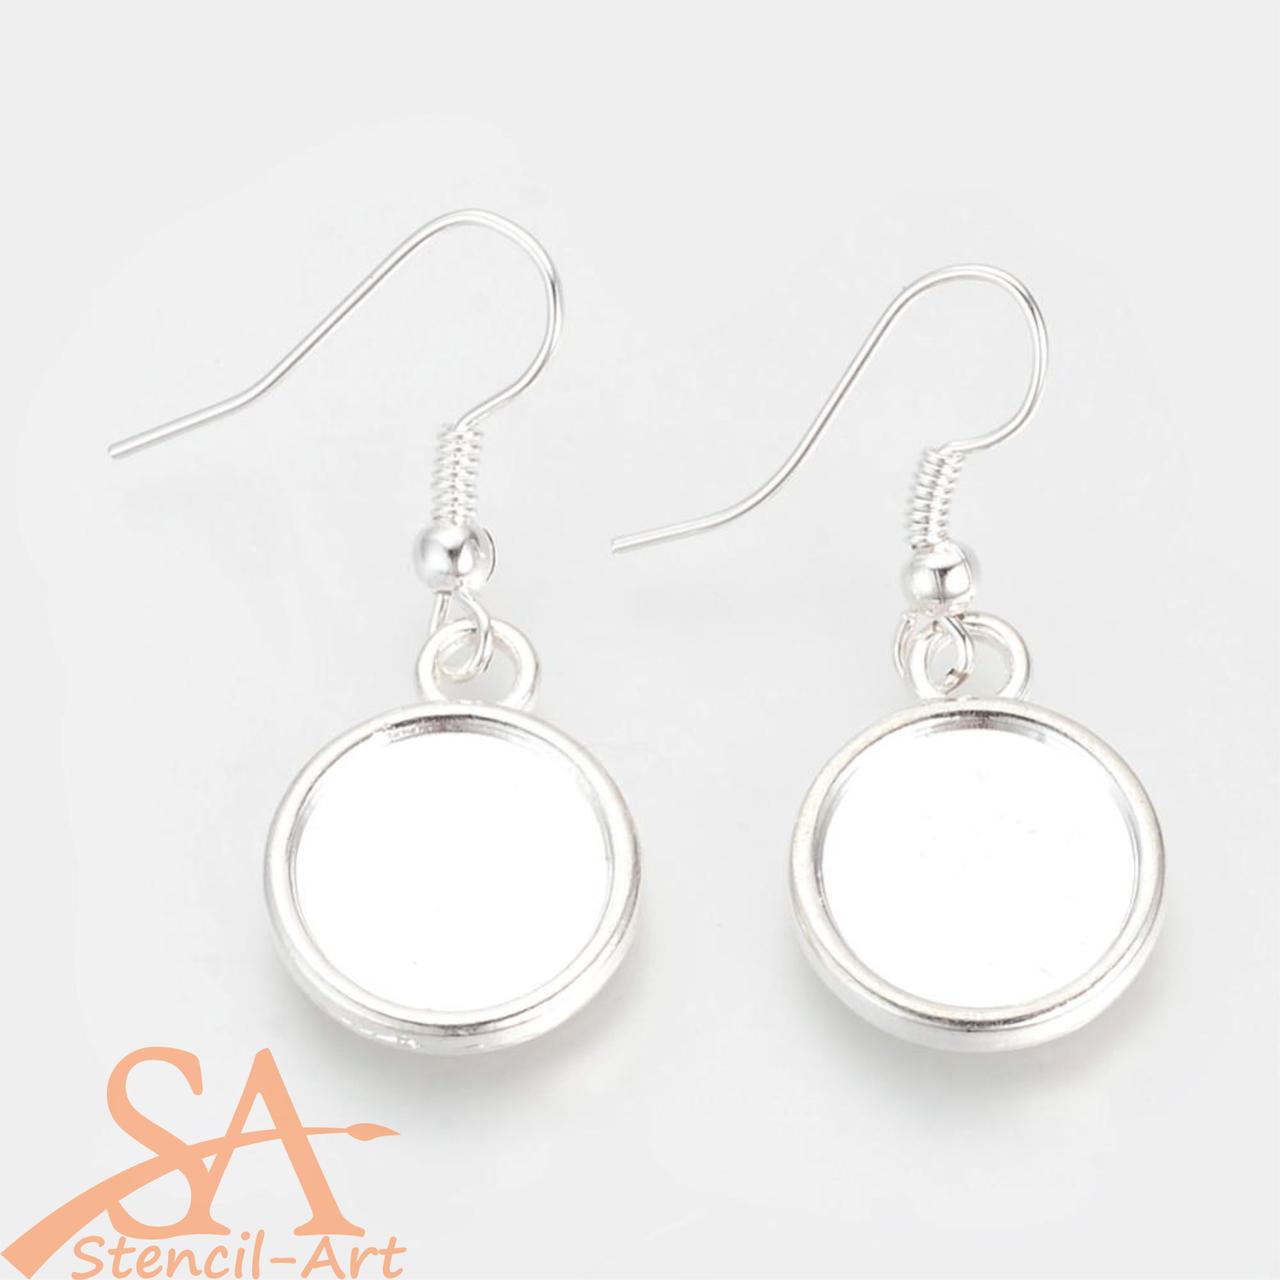 Alloy Earring Hooks 12mm-Cabochon Setting Silver 10/pkg